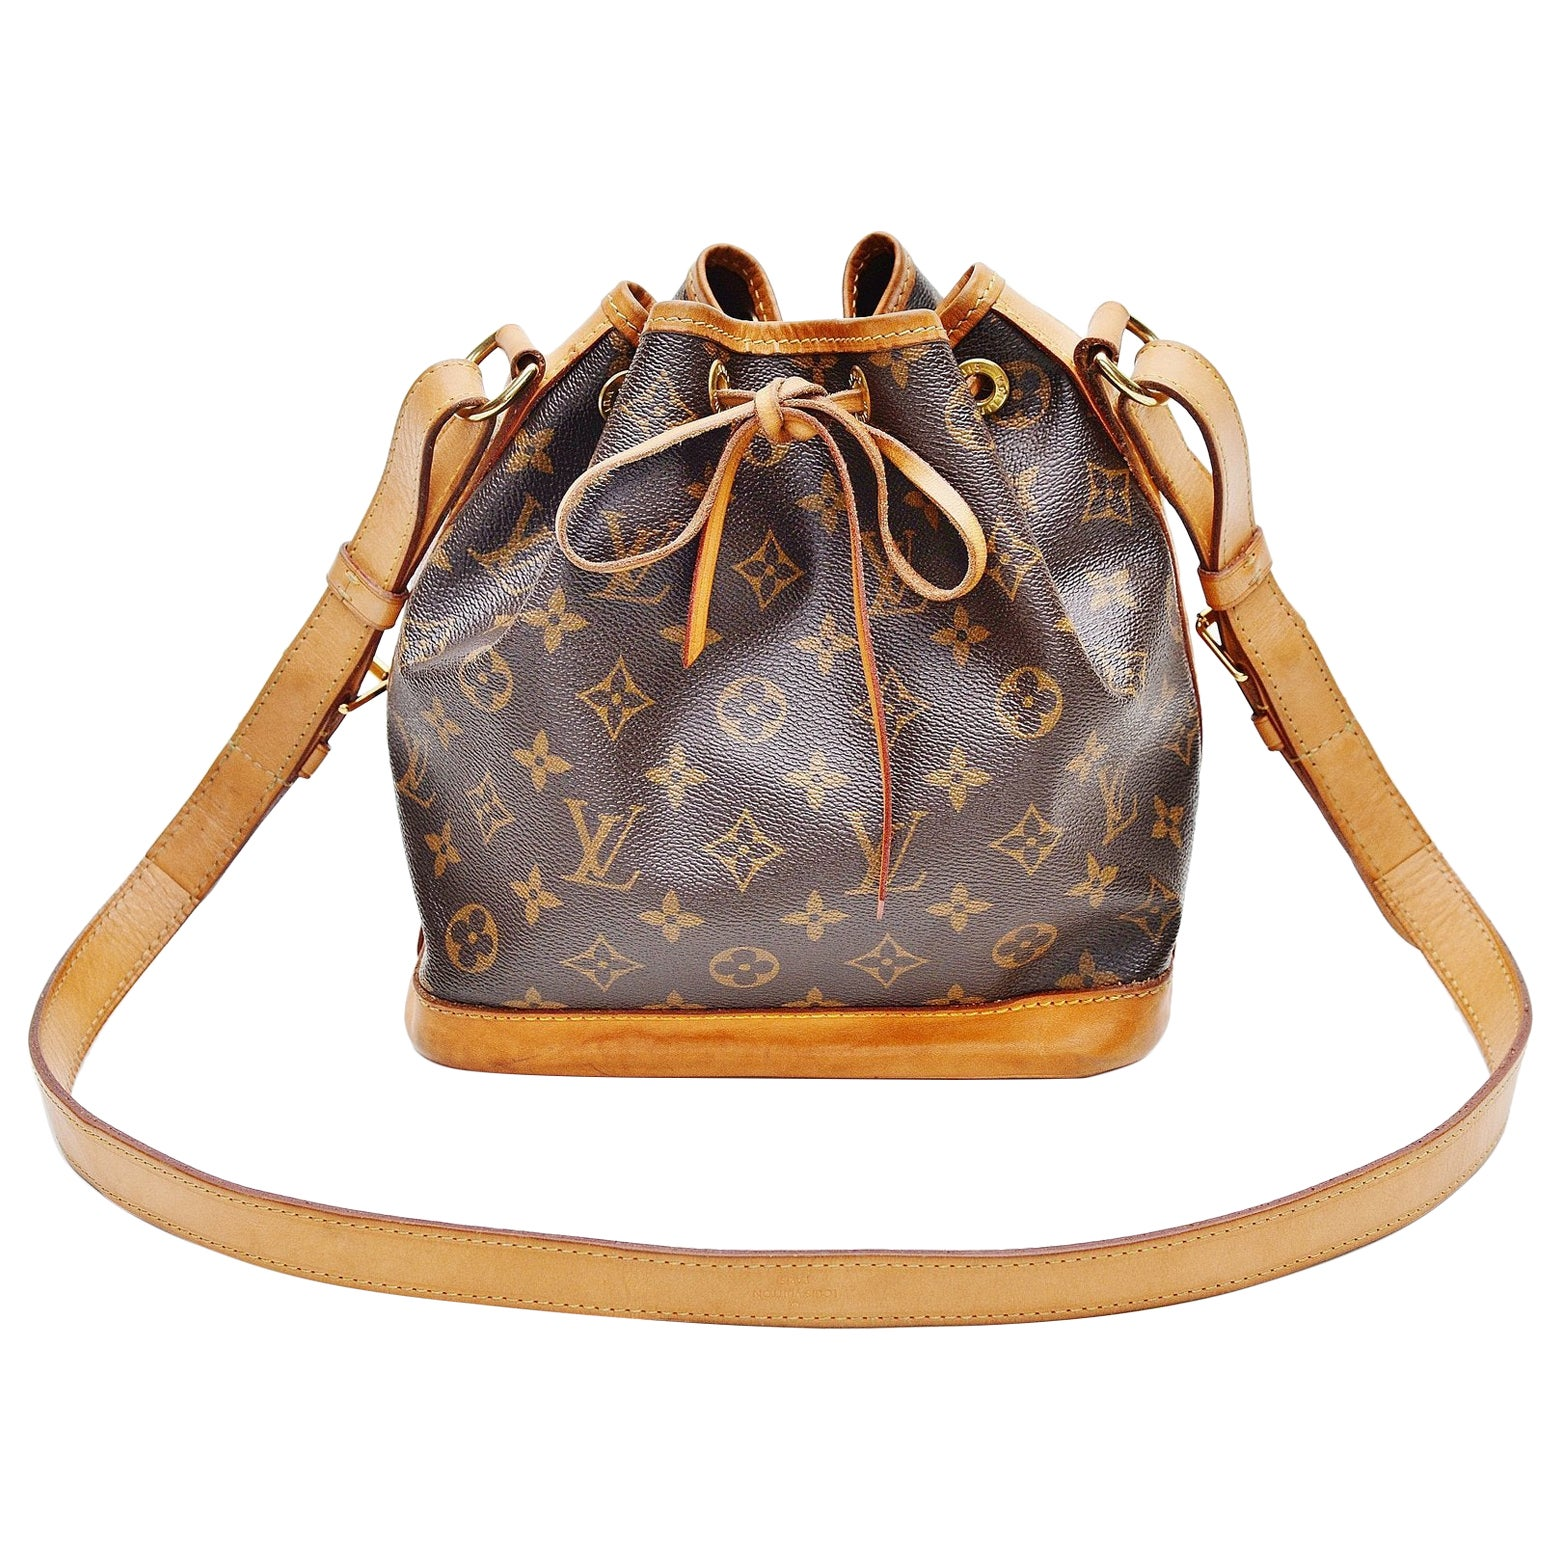 Louis Vuitton Monogram Noe BB Bag